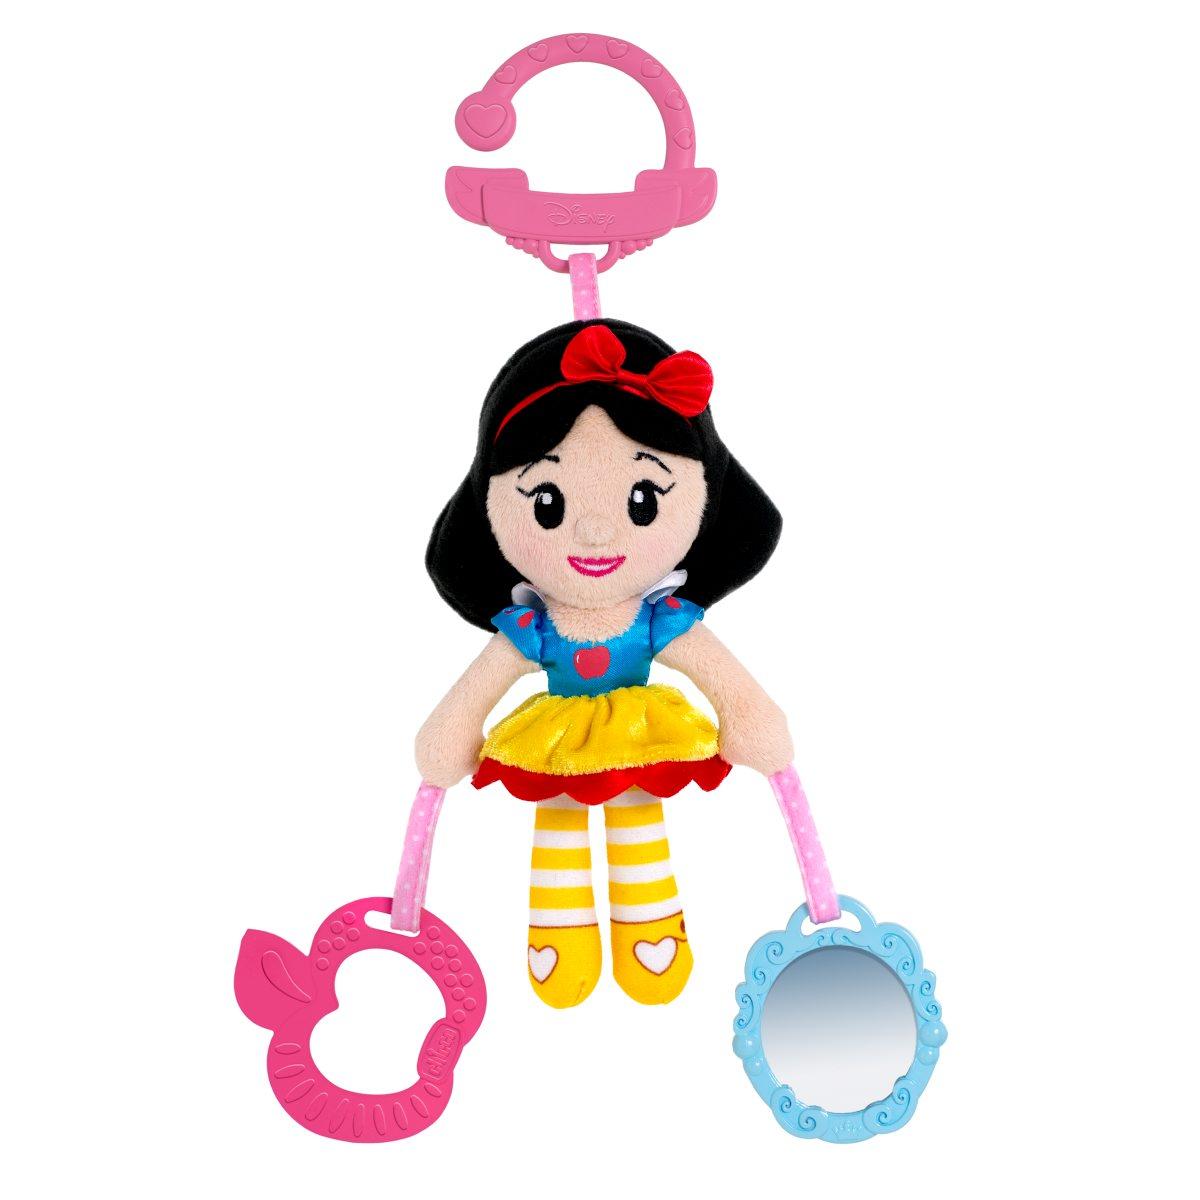 Chicco Disney Игрушка для коляски Белоснежка00007806000000